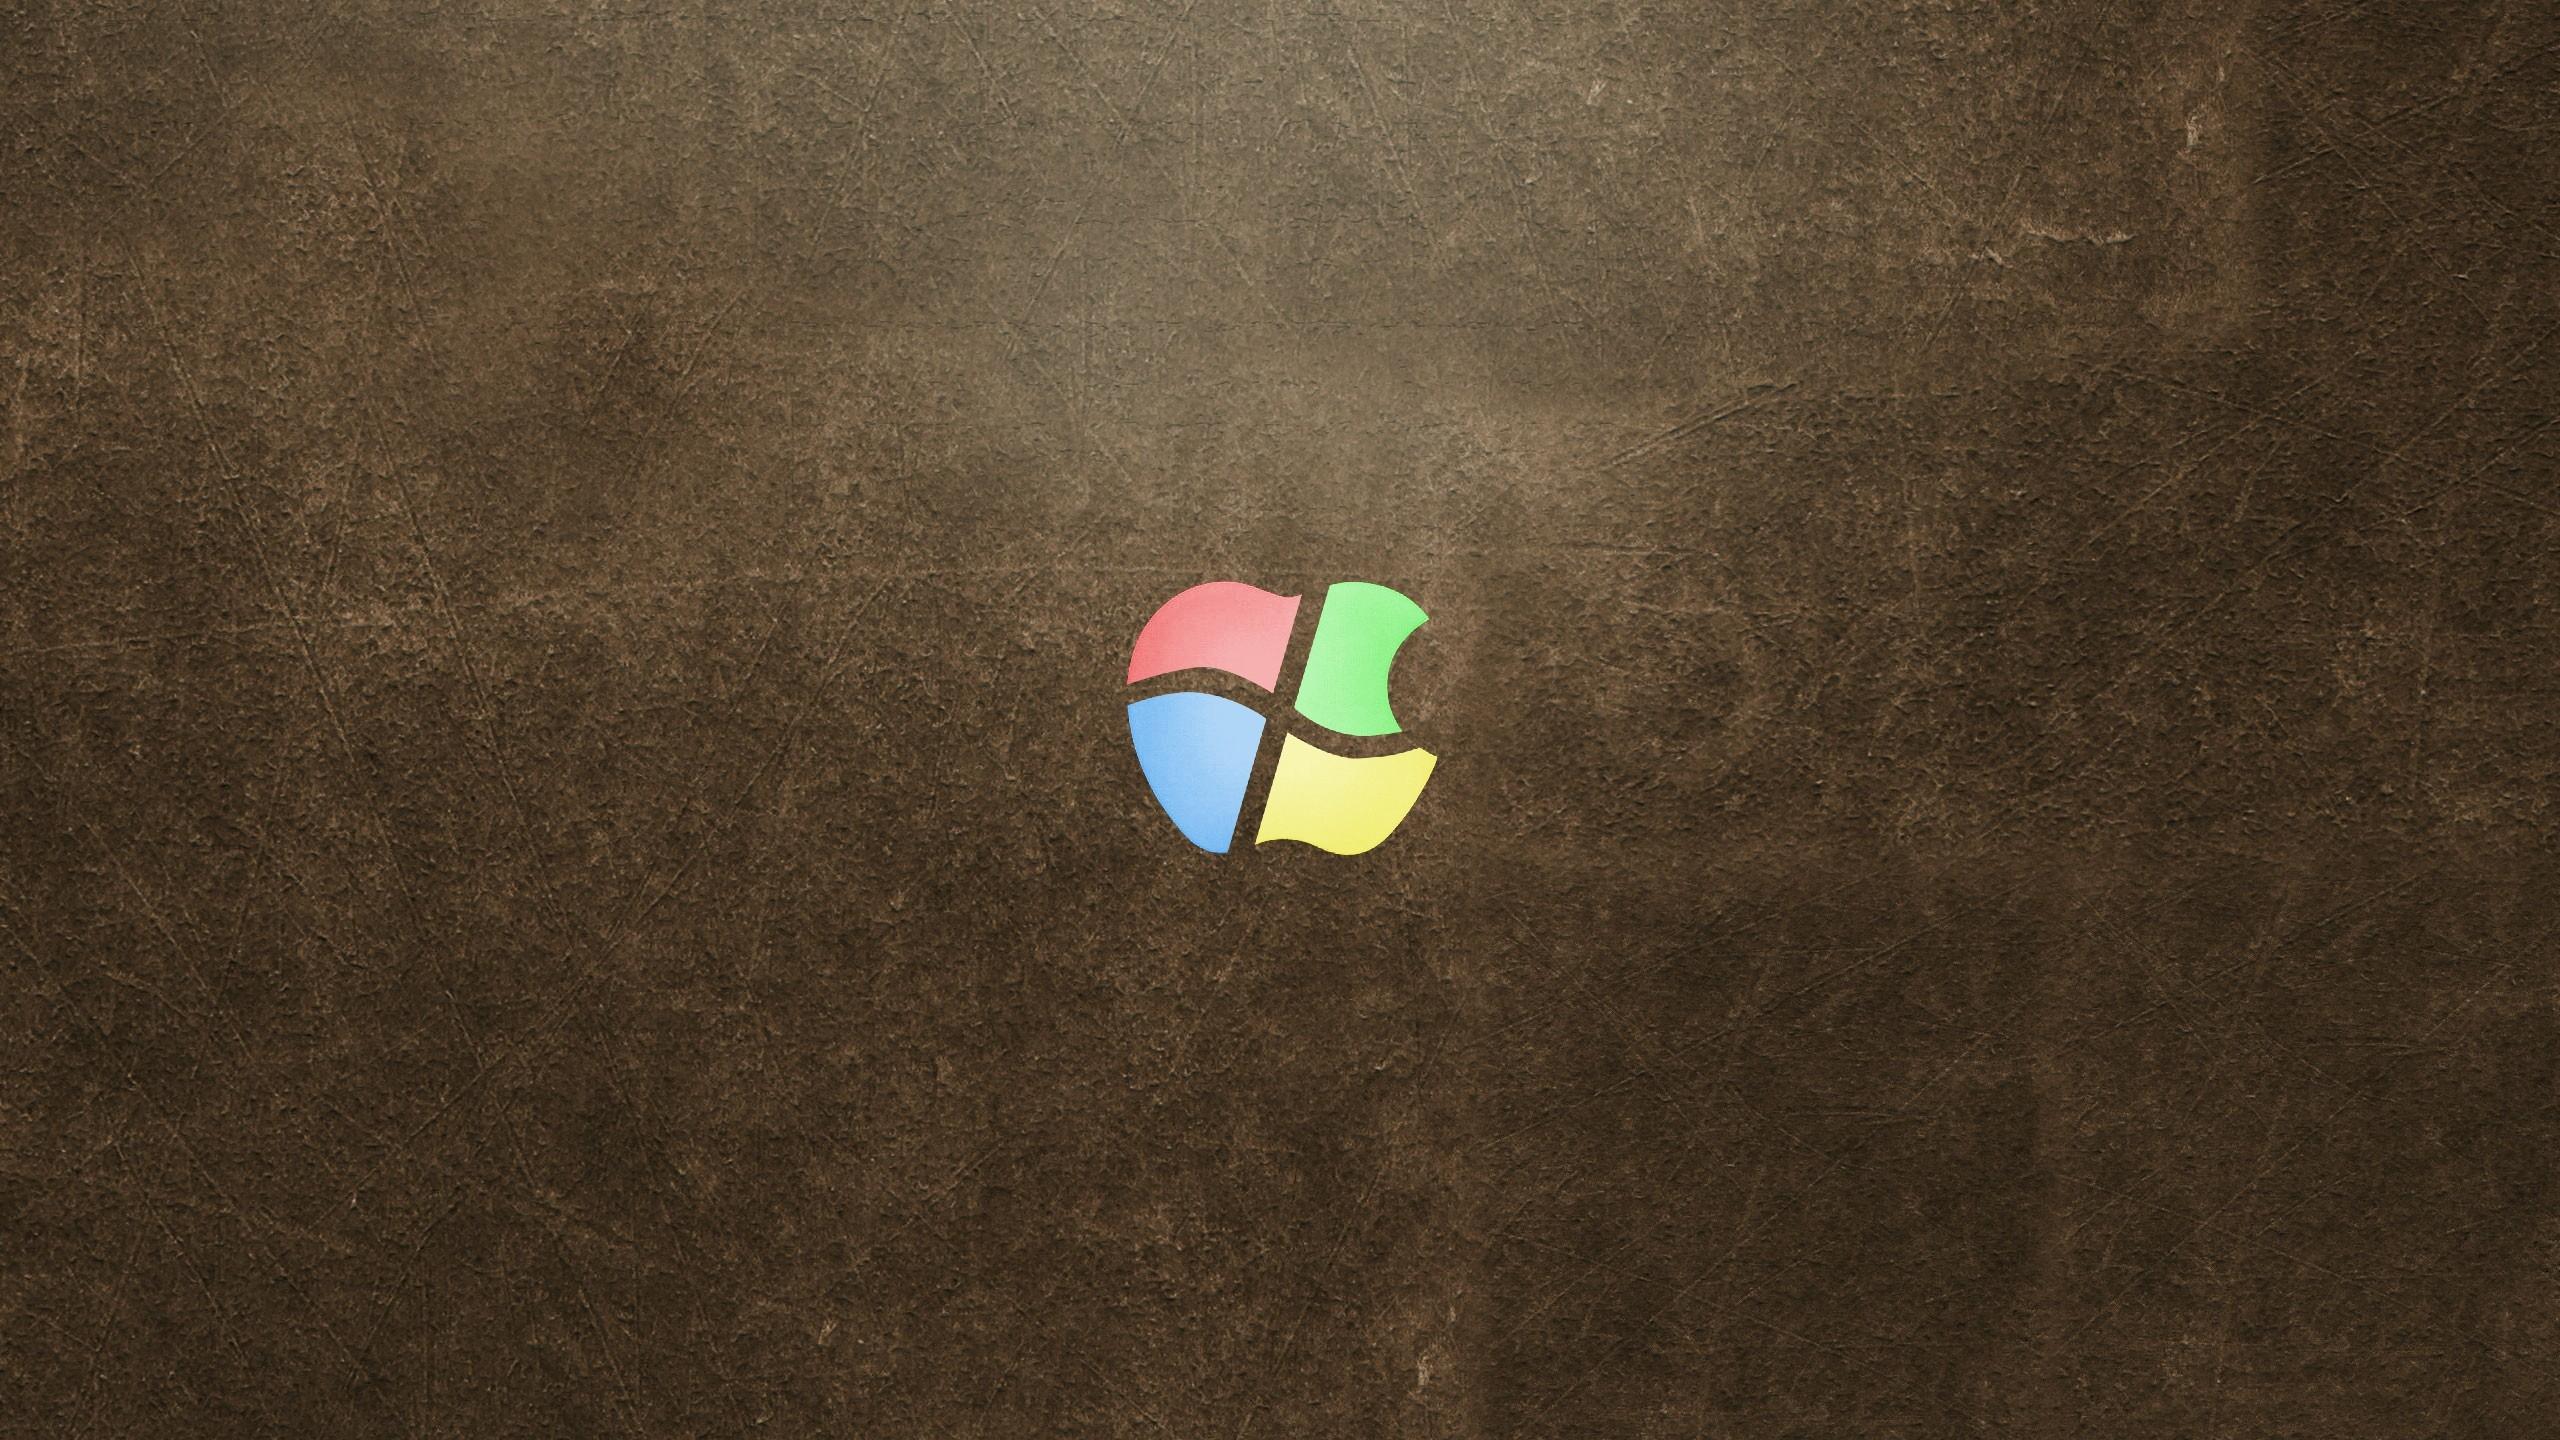 2560x1440 Wallpaper brand windows apple 2560x1440